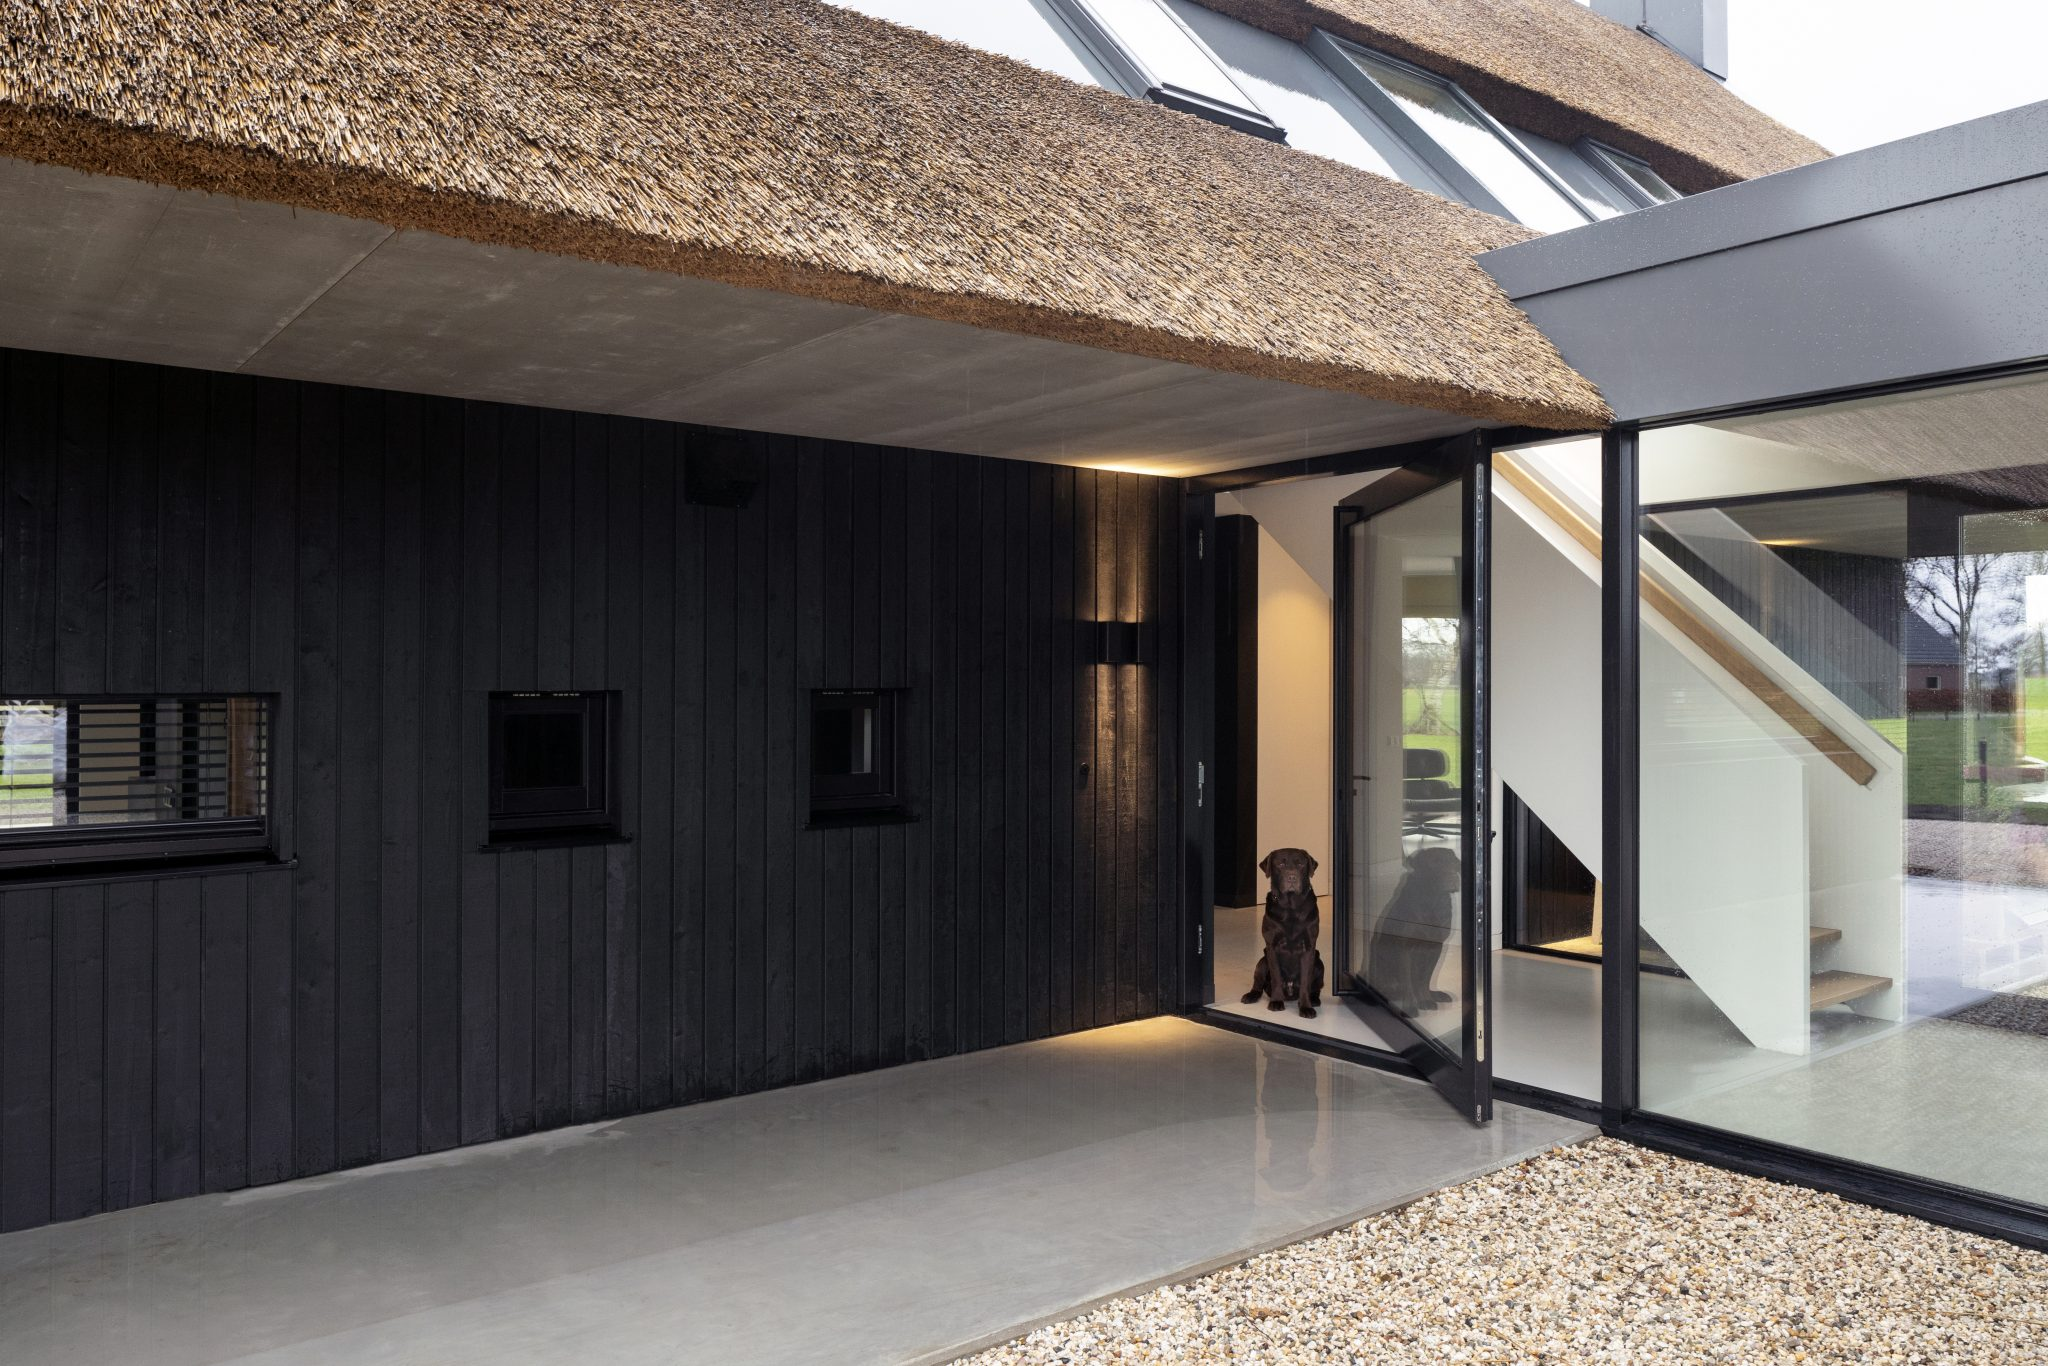 exterior-pivot-door-with-fritsjurgens-system-one-1-e1560347269723.jpg